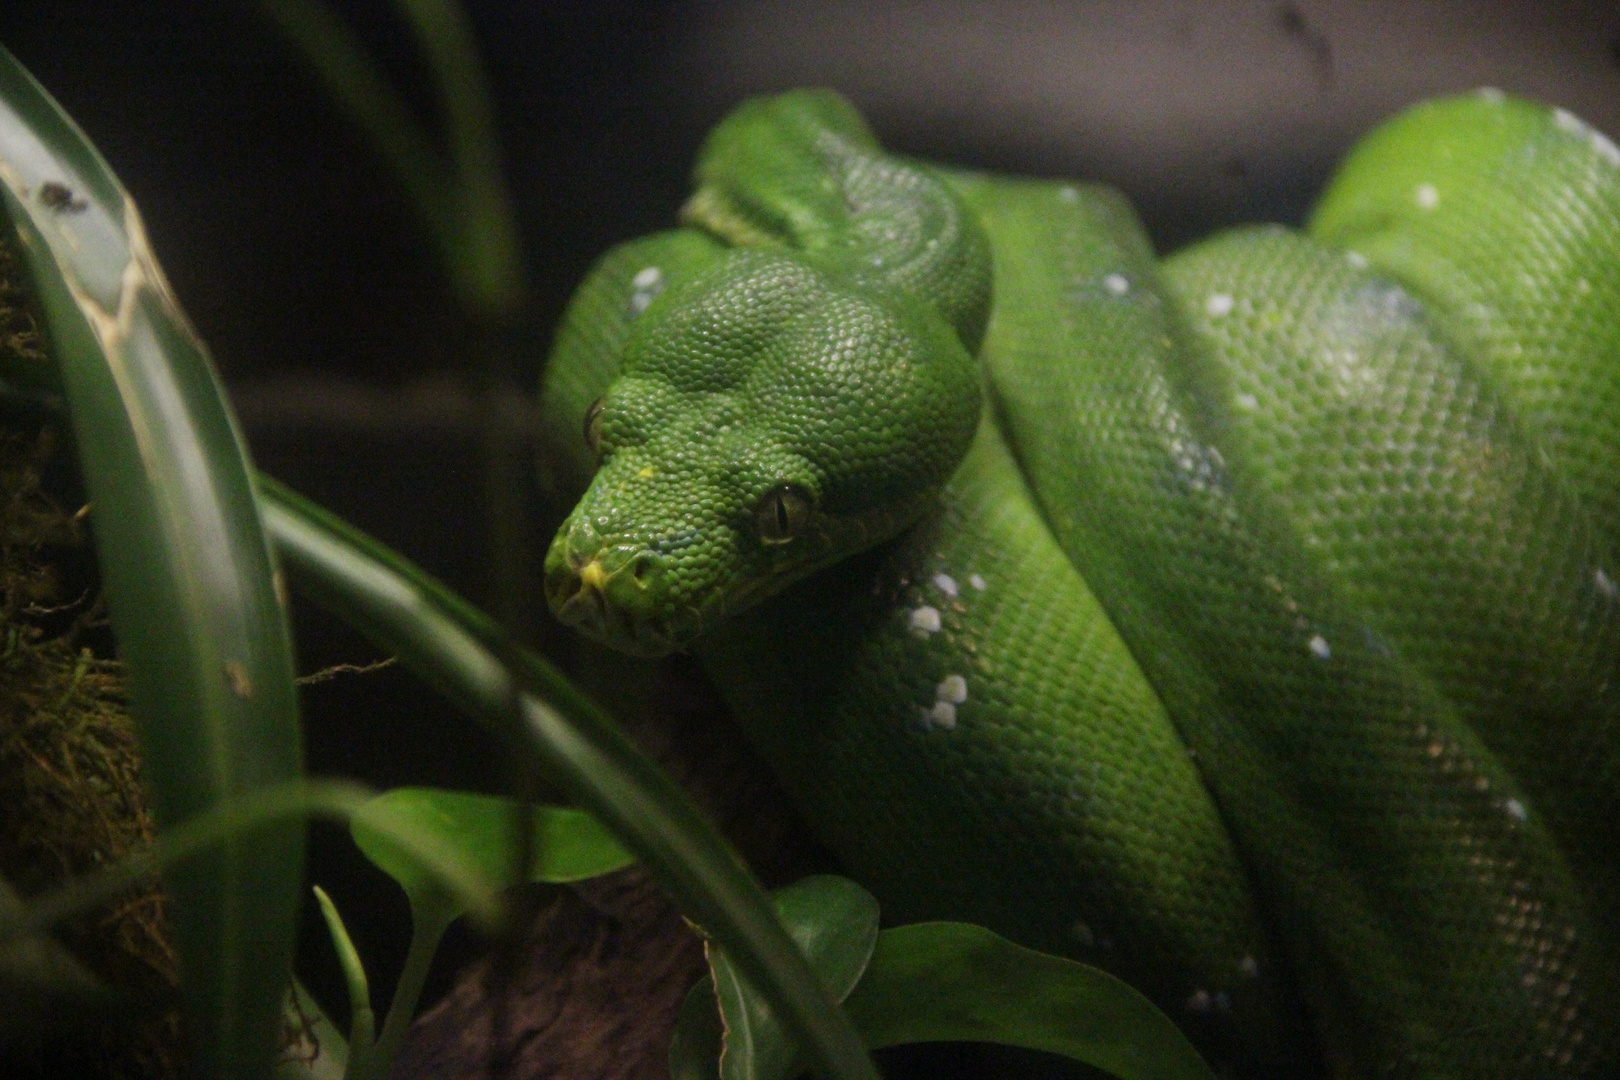 Il sempre verde - serpente